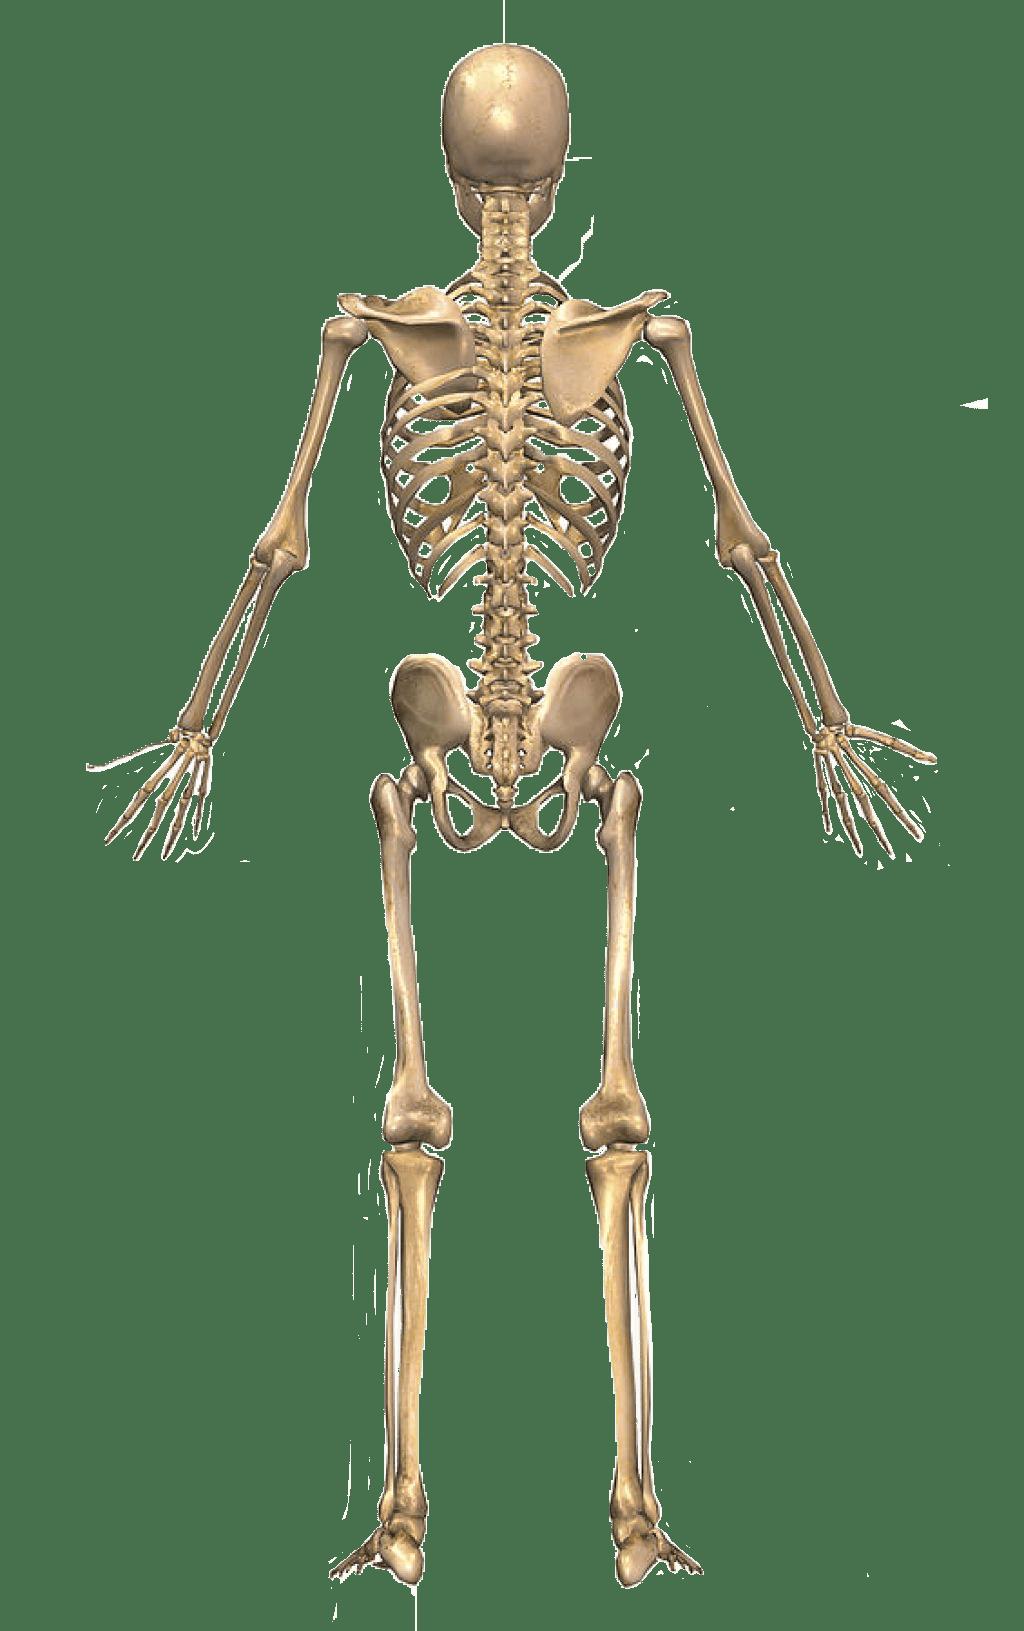 bones human skeleton diagram back franklin electric submersible motor wiring ཚནརག  page 2 བདཀསཚགསའཕདབསནདབ